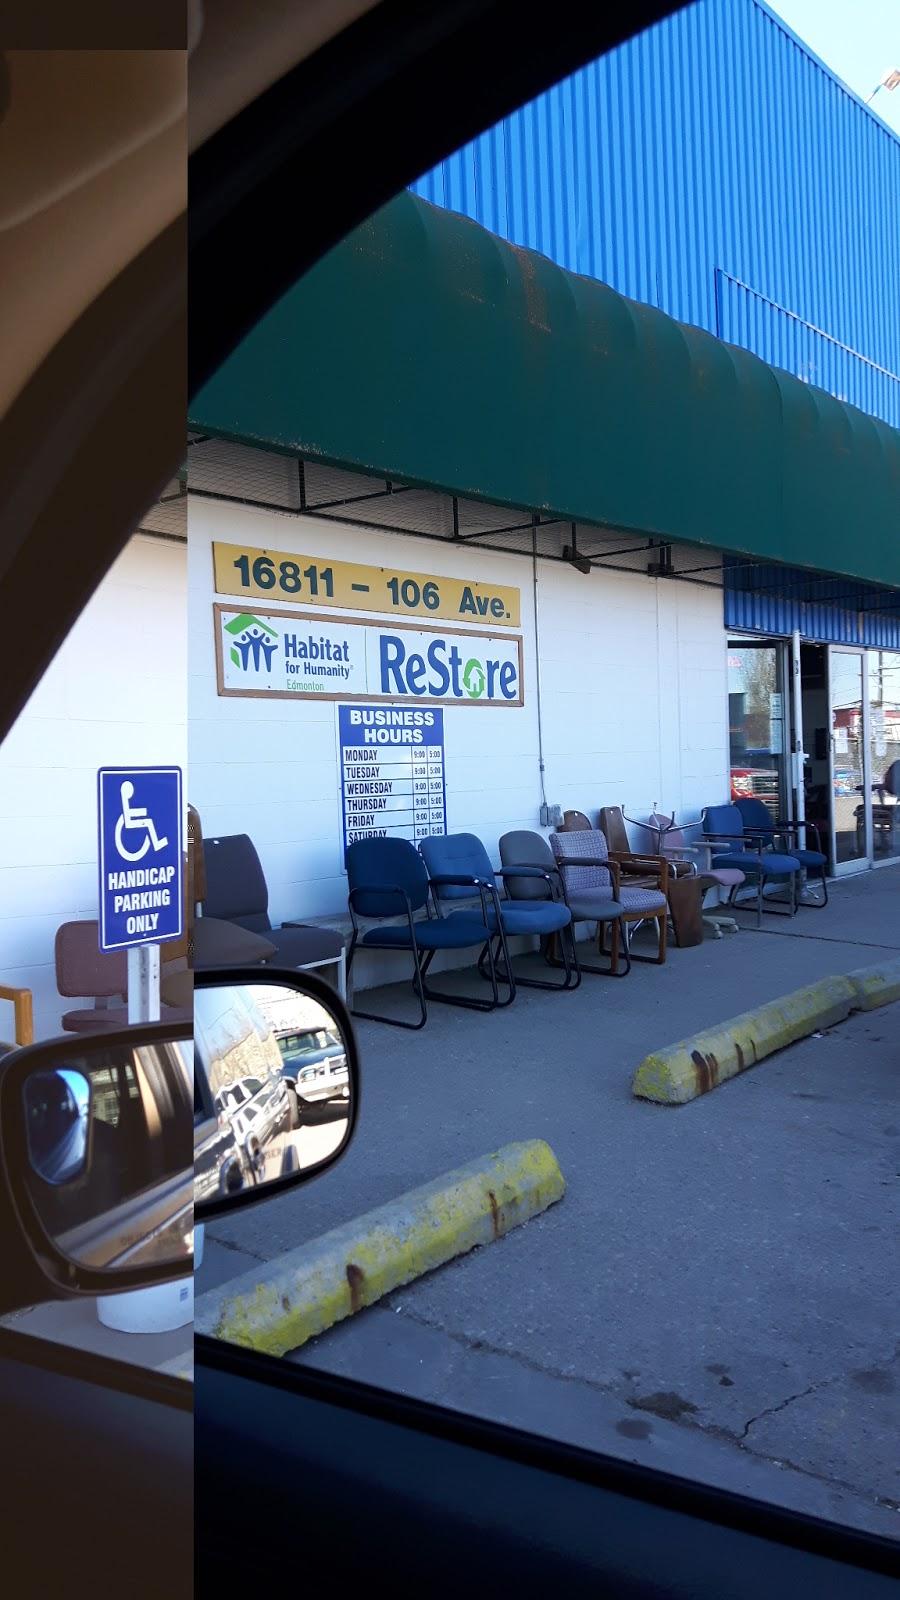 Habitat for Humanity Edmonton - ReStore West   store   16811 106 Ave NW, Edmonton, AB T5P 4G1, Canada   7804550645 OR +1 780-455-0645